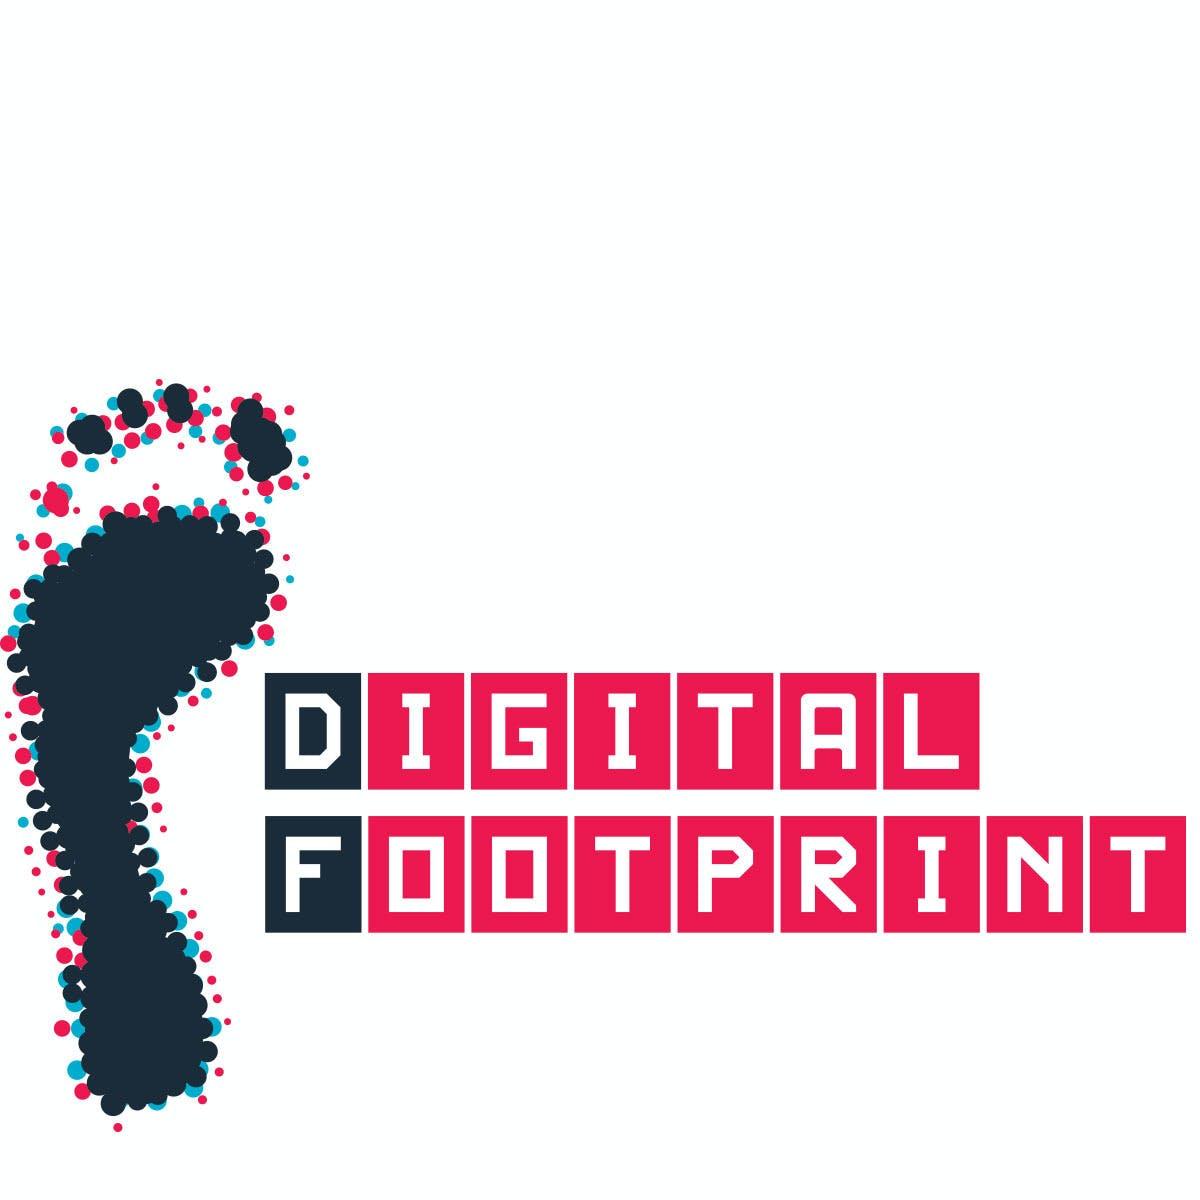 Digital Footprint Coursera